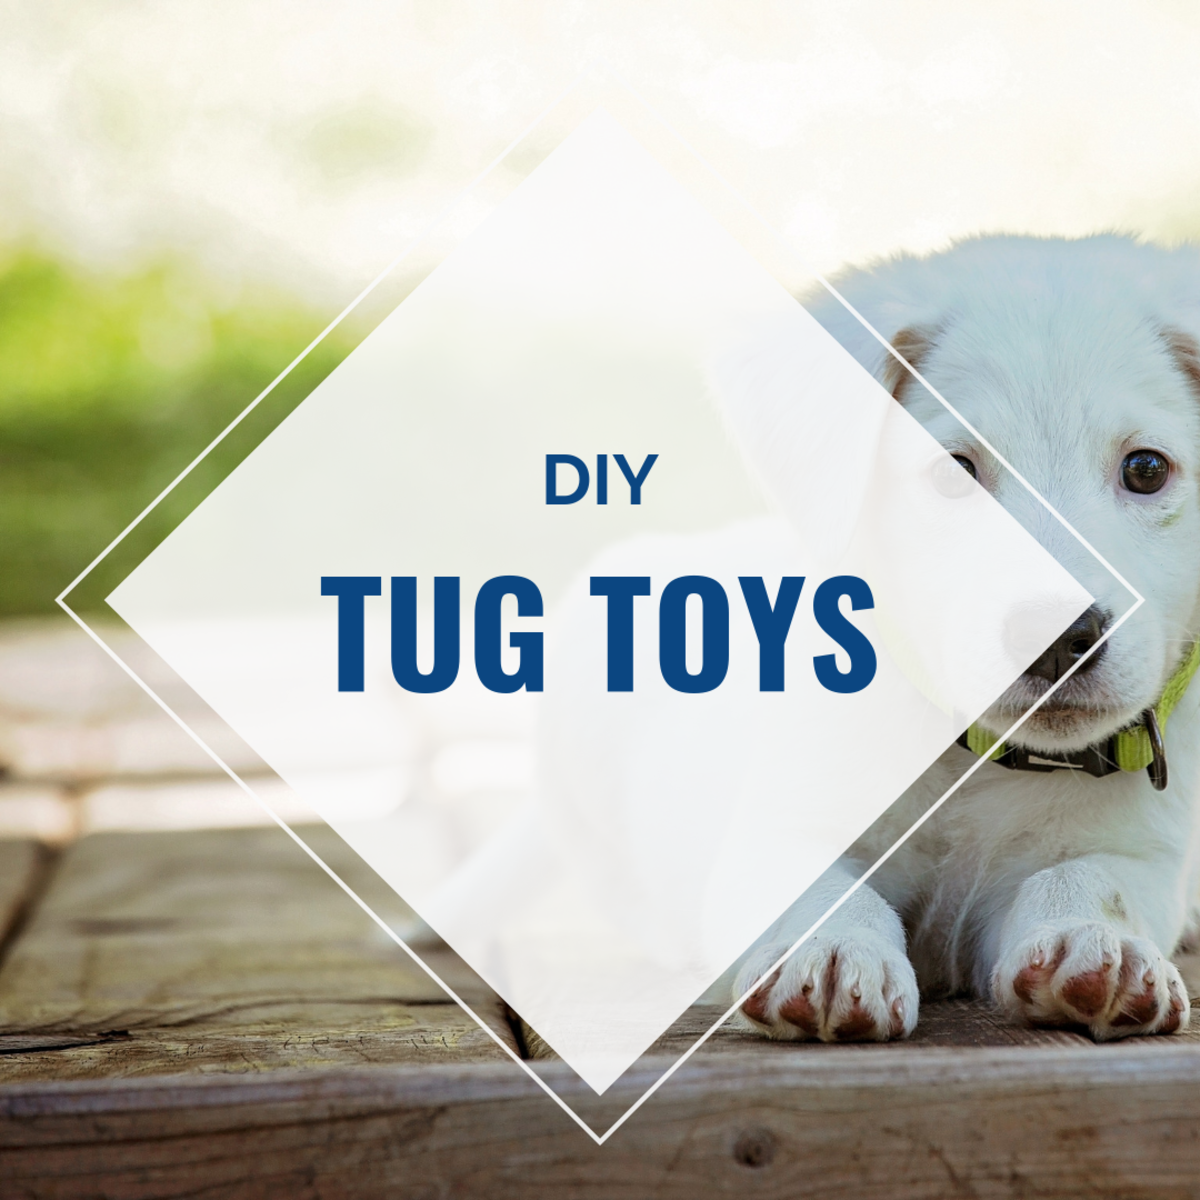 DIY Tug Toys